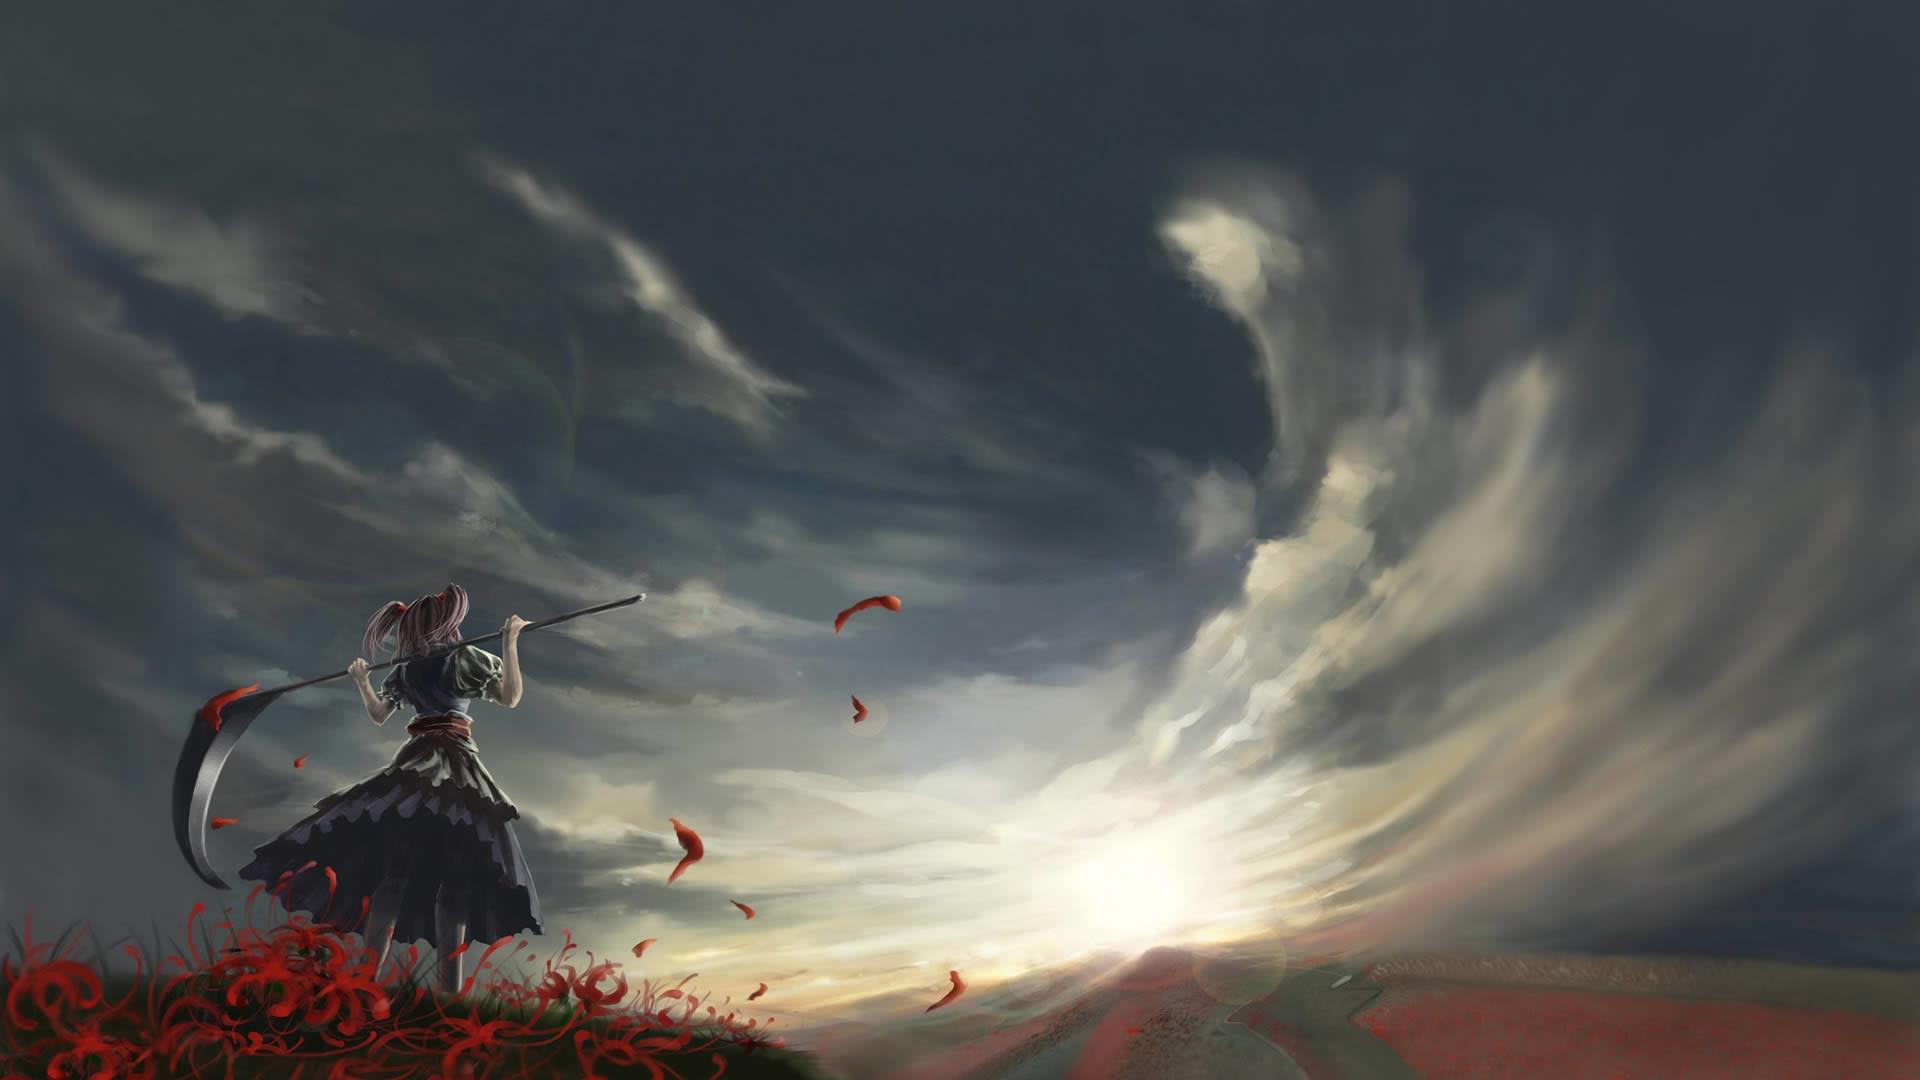 Beautiful anime wallpaper wallpapertag - Anime backdrop wallpaper ...